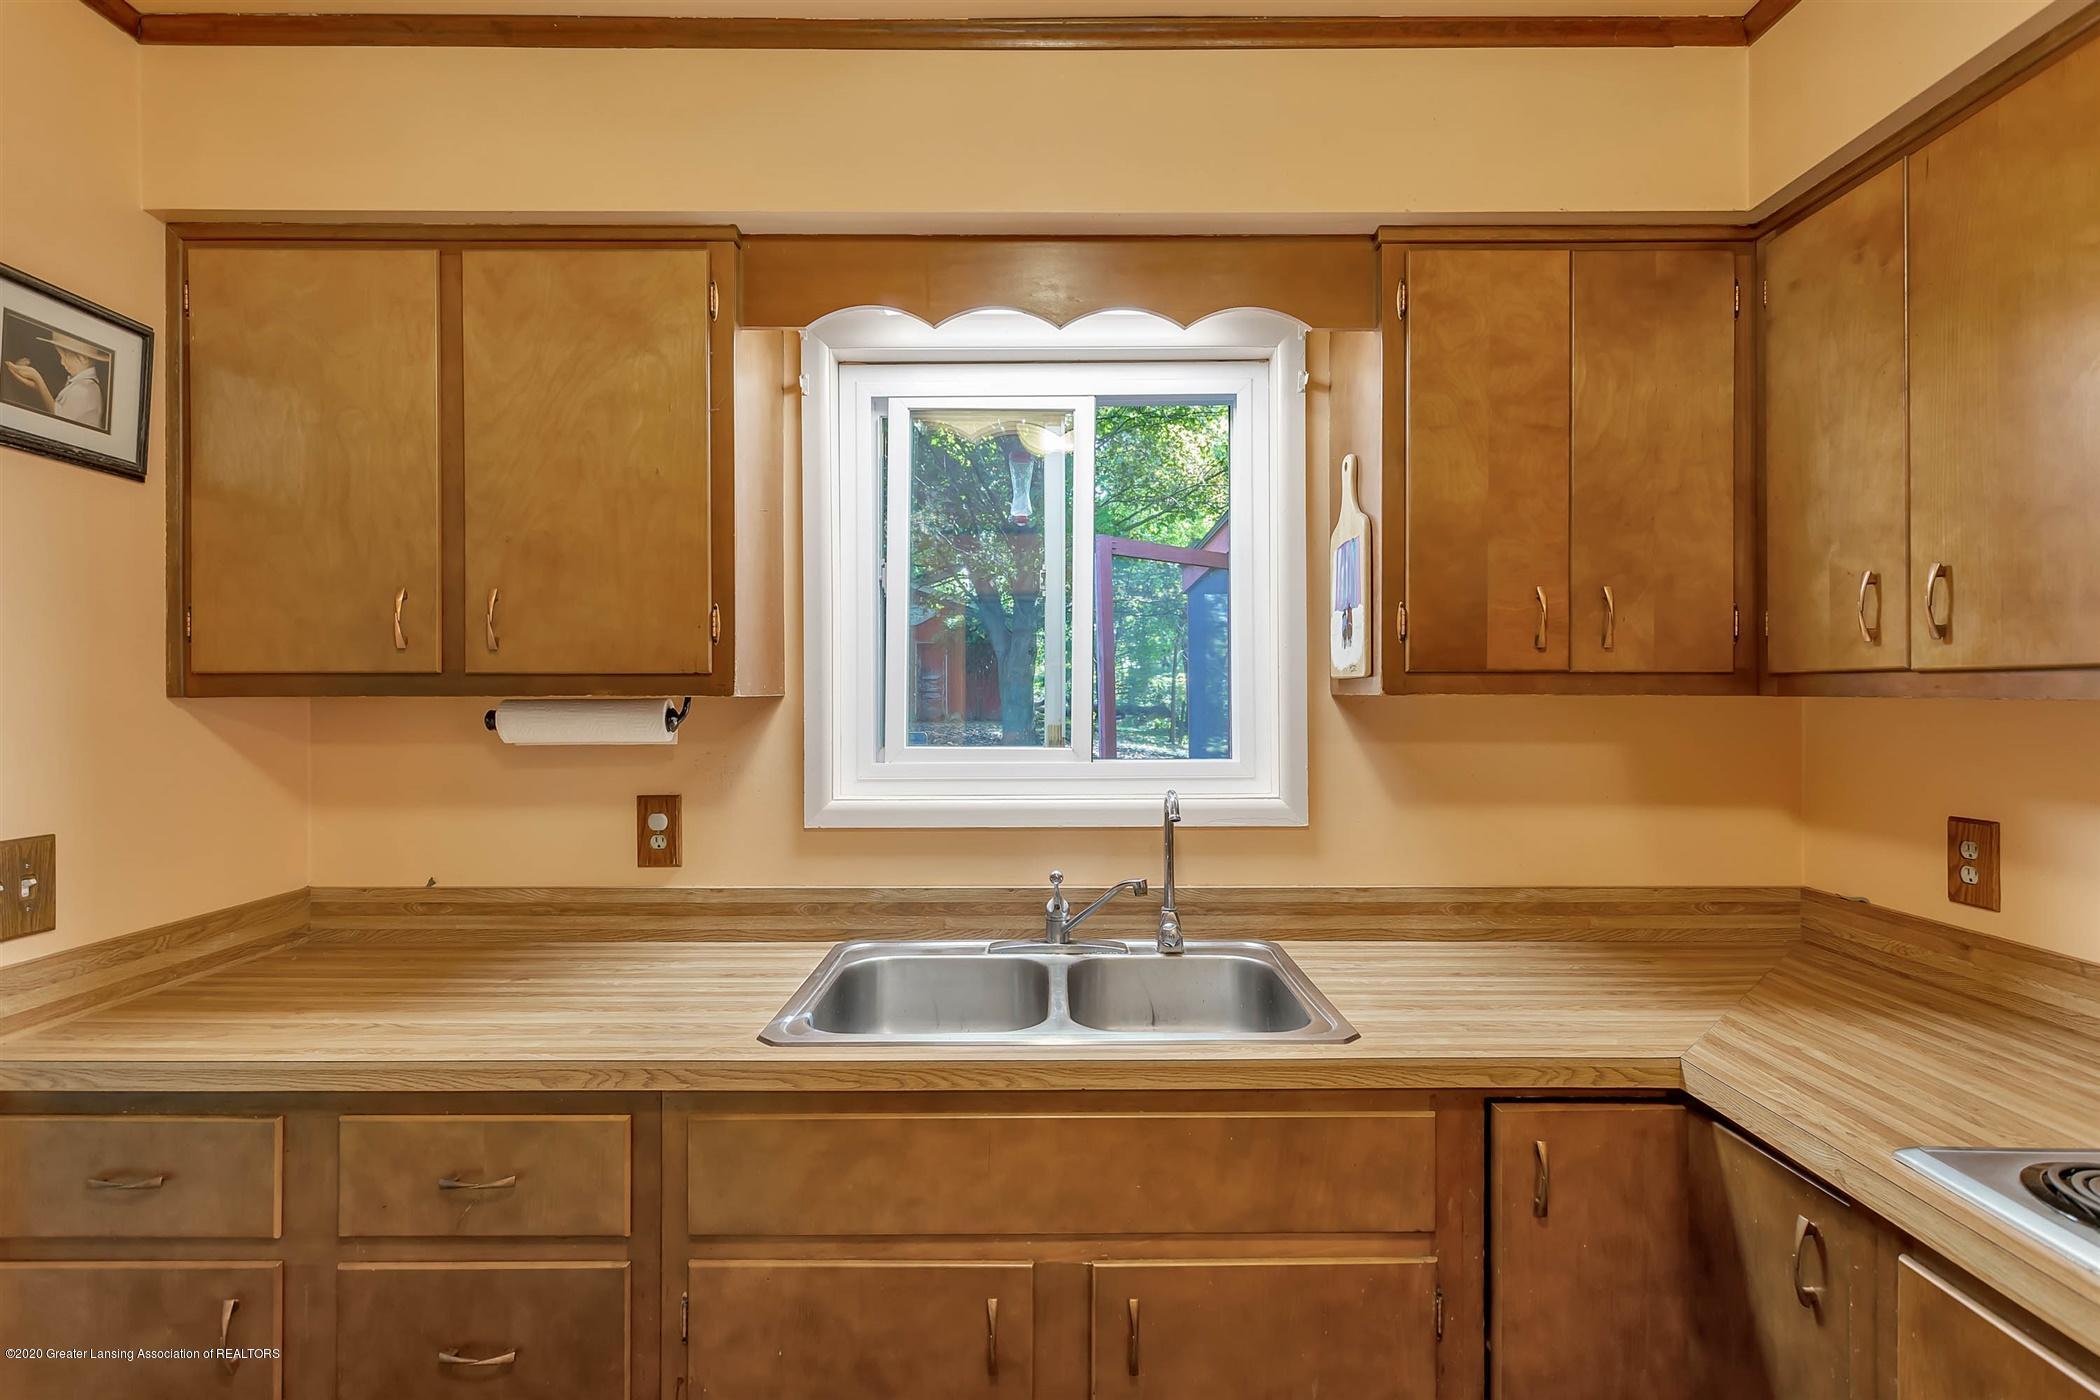 5110 E Clark Rd - 15-5110 Clark Rd-WindowStill-Real-E - 15